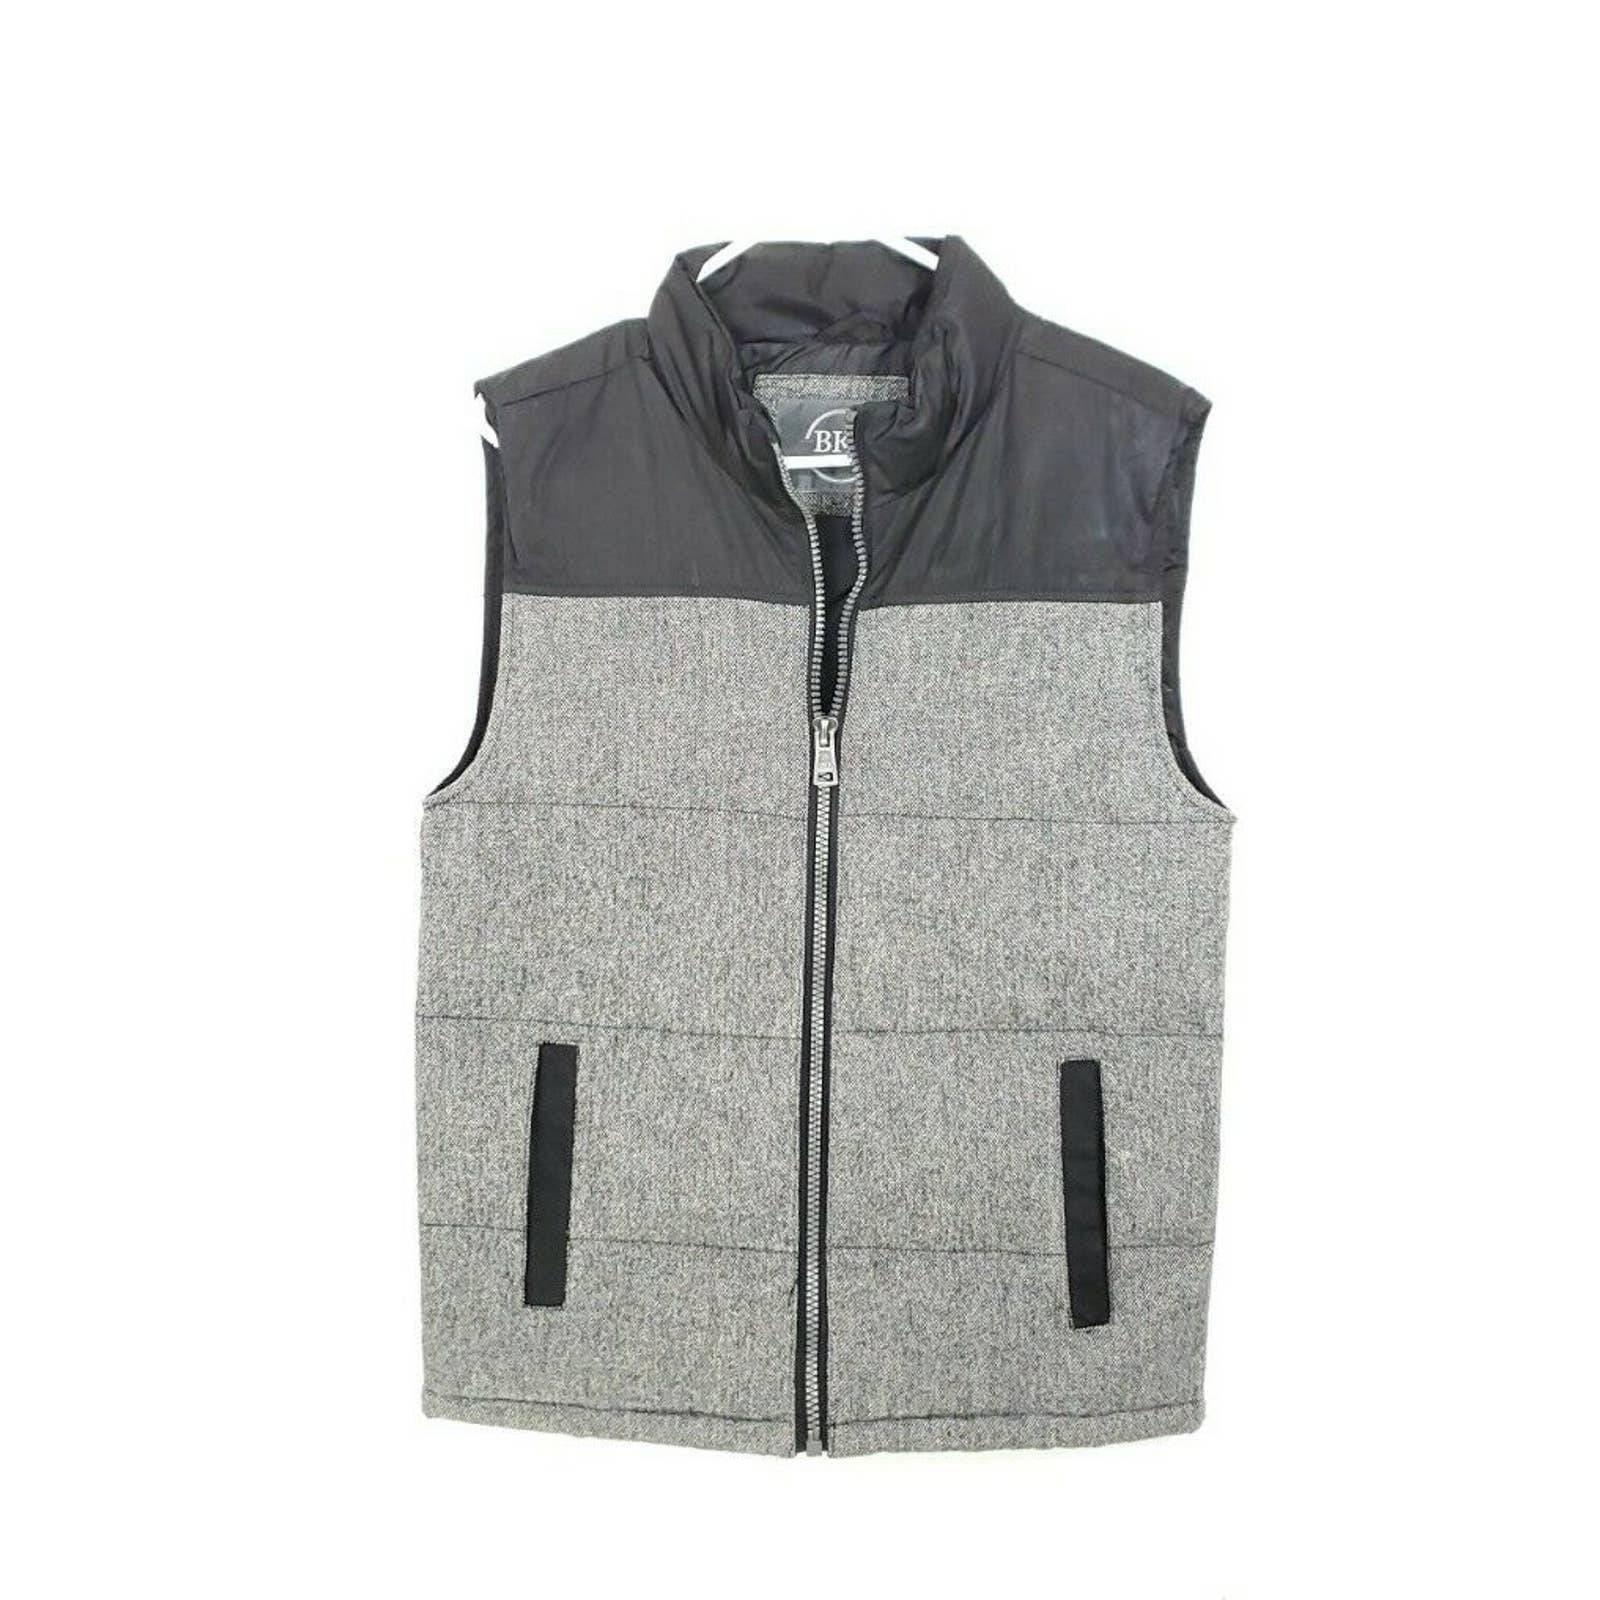 BKE Vest Wool Blend Gray Standard Fit M